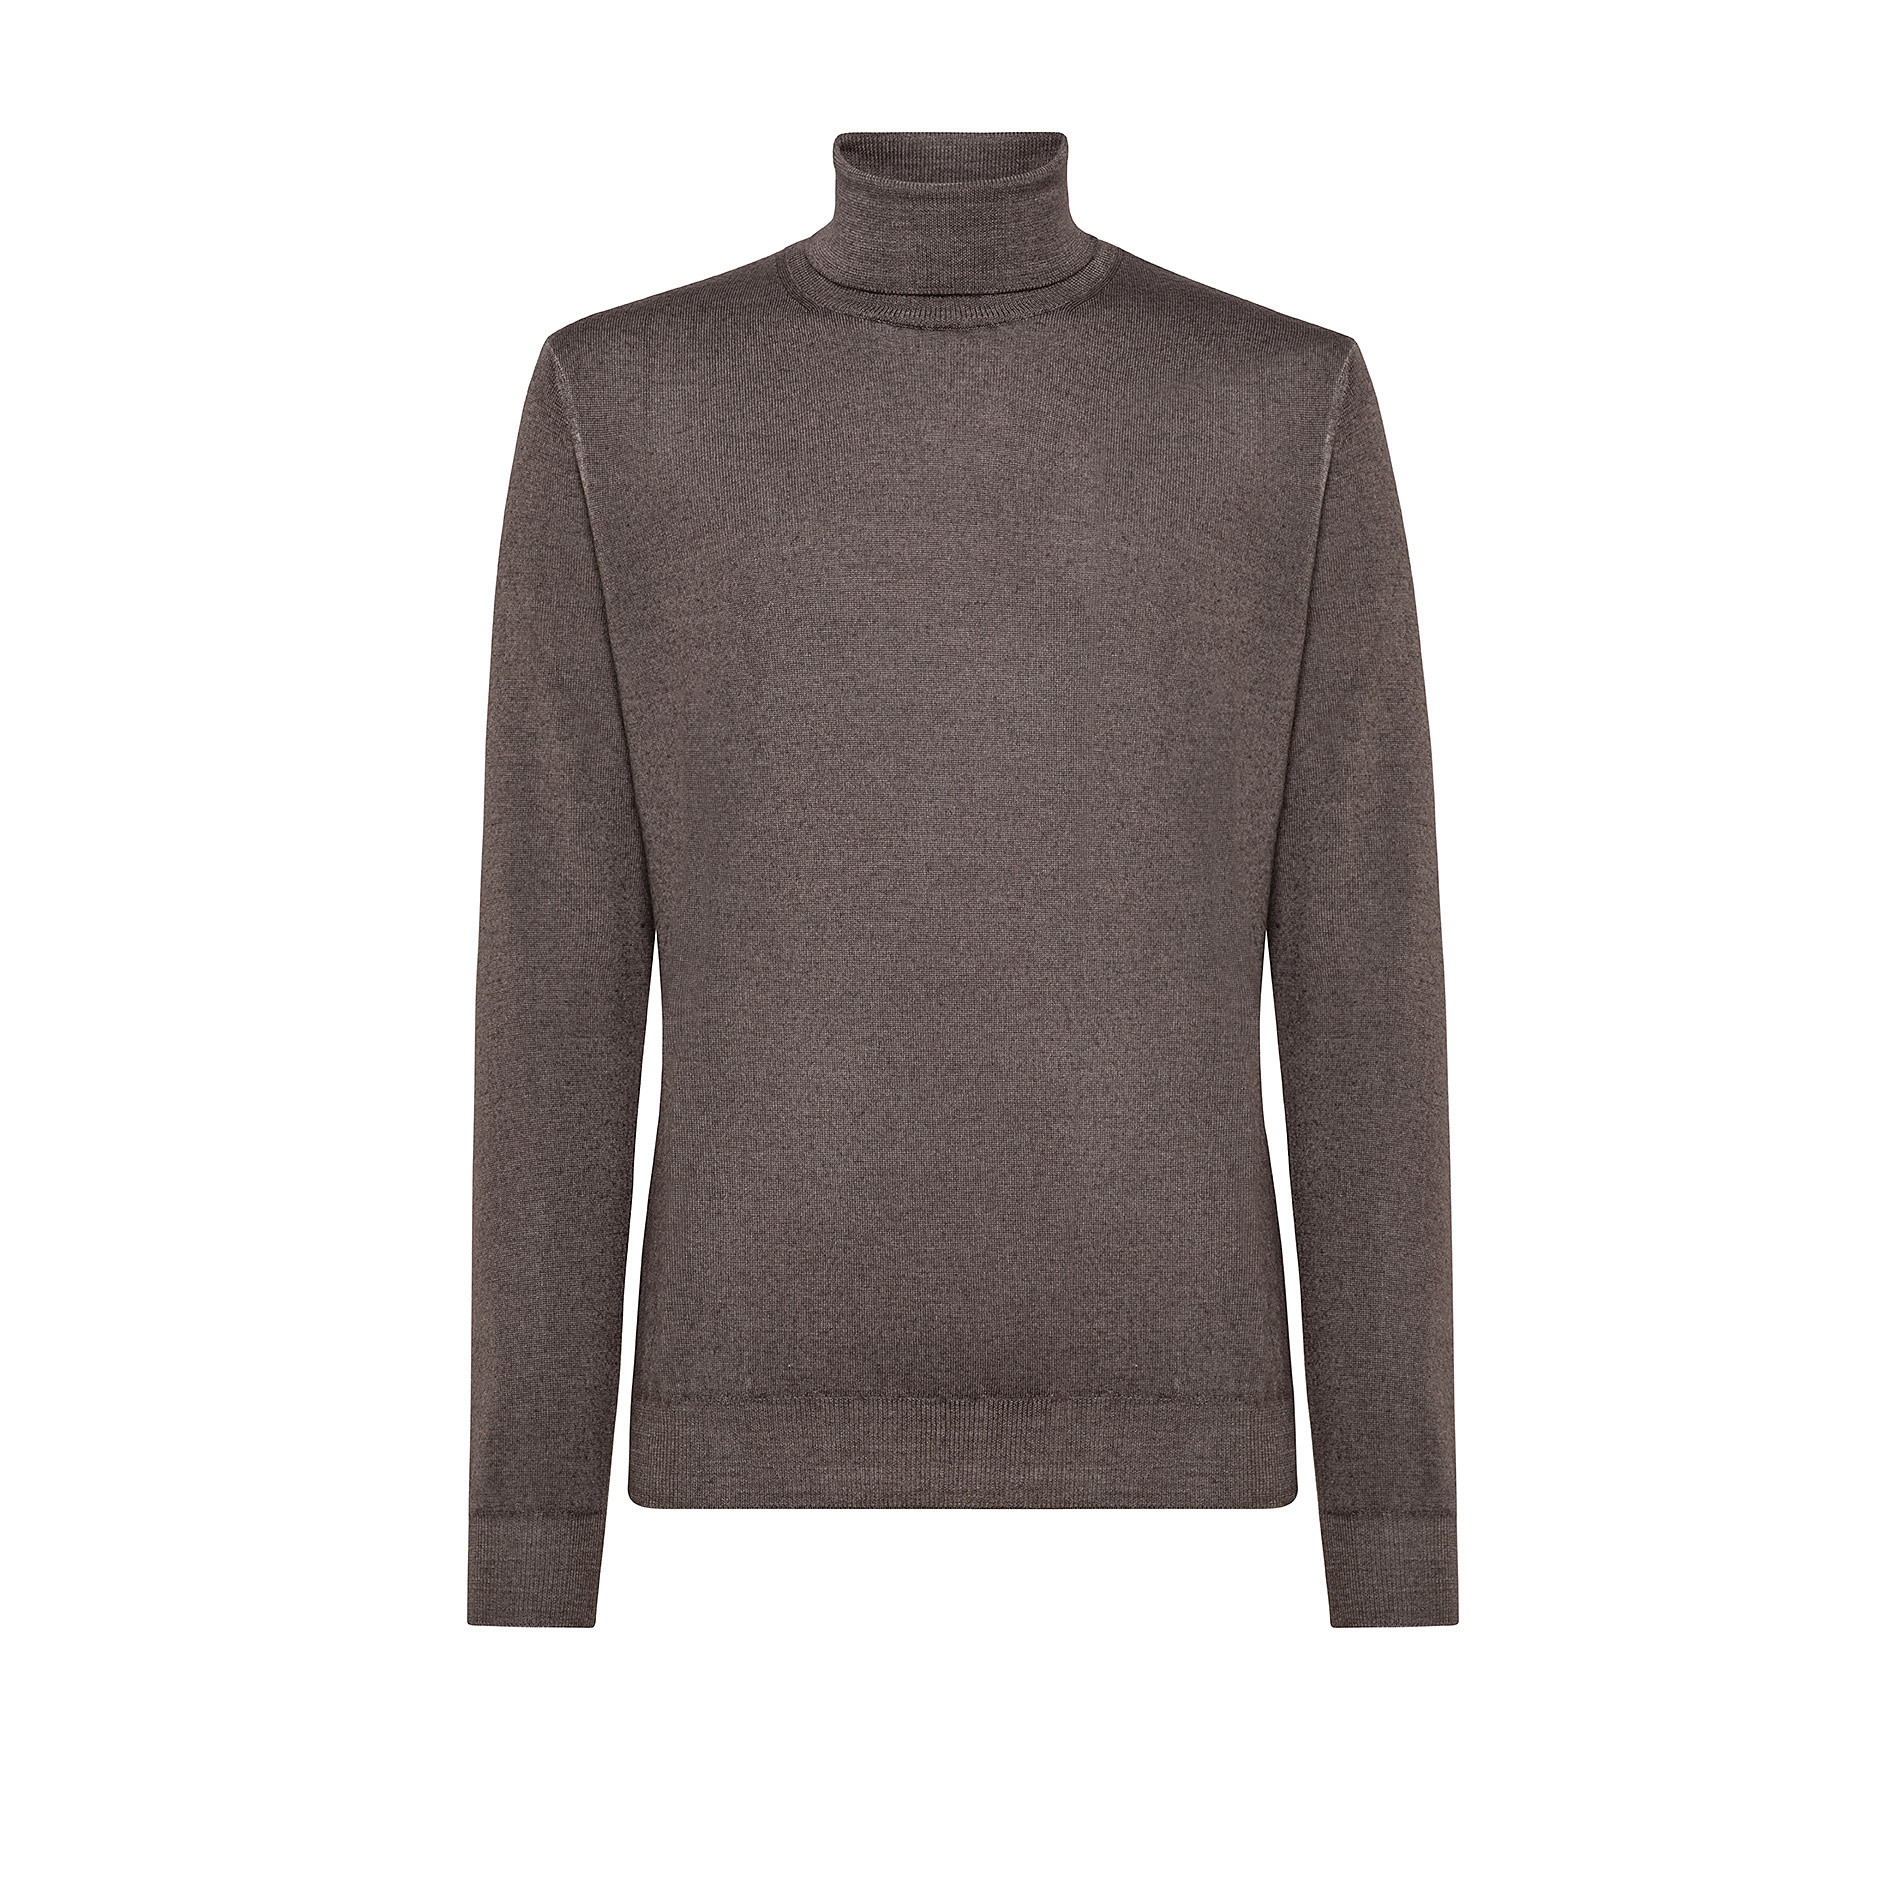 Pullover lana merinos collo alto, Marrone, large image number 0